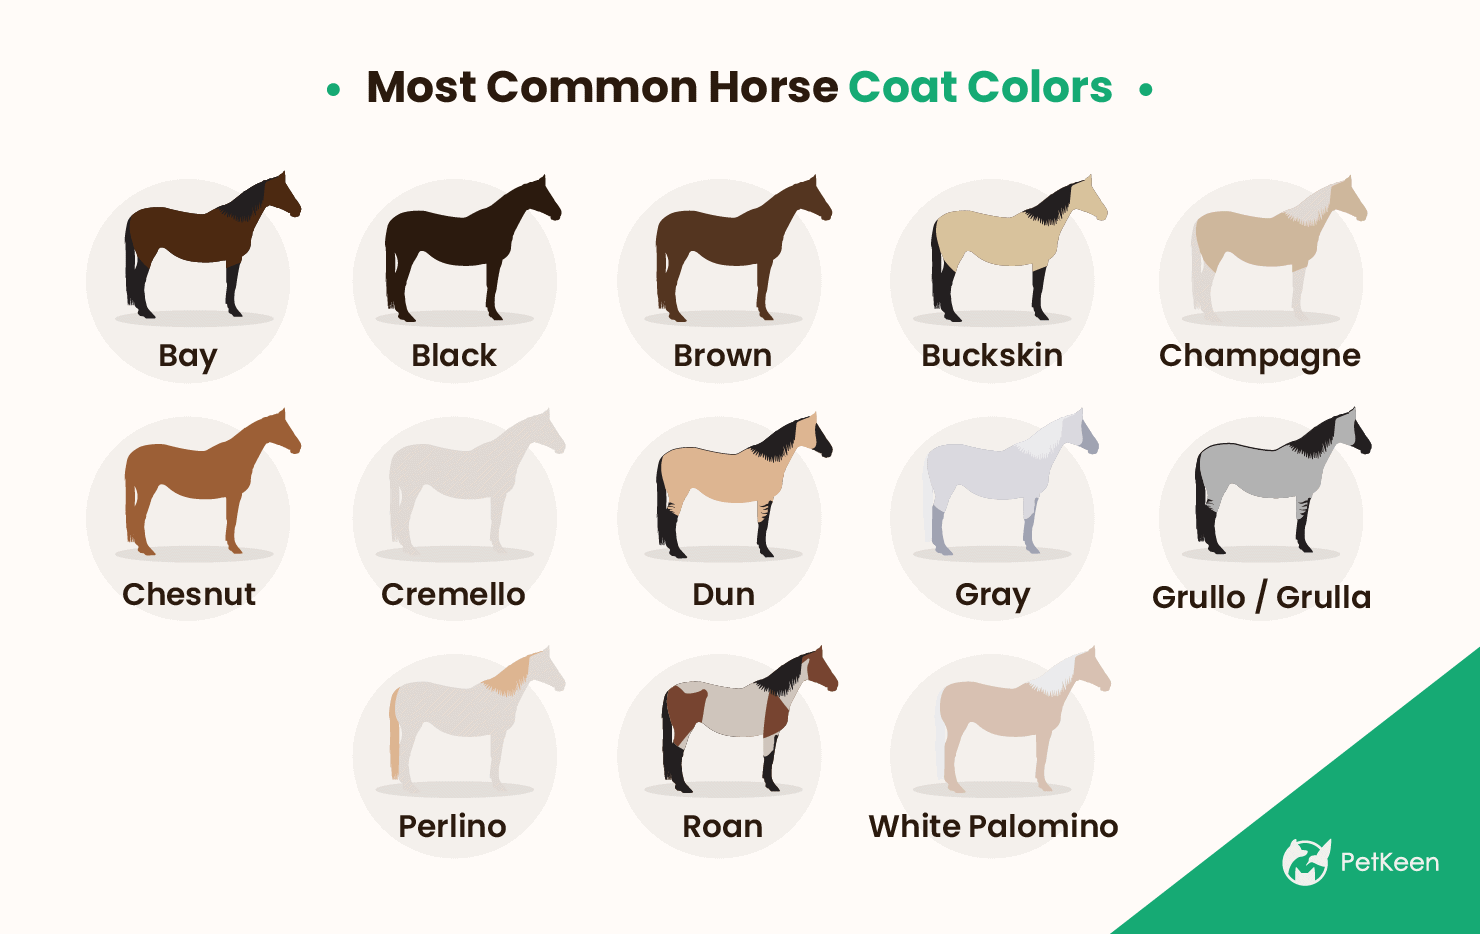 Most common horse coat colors